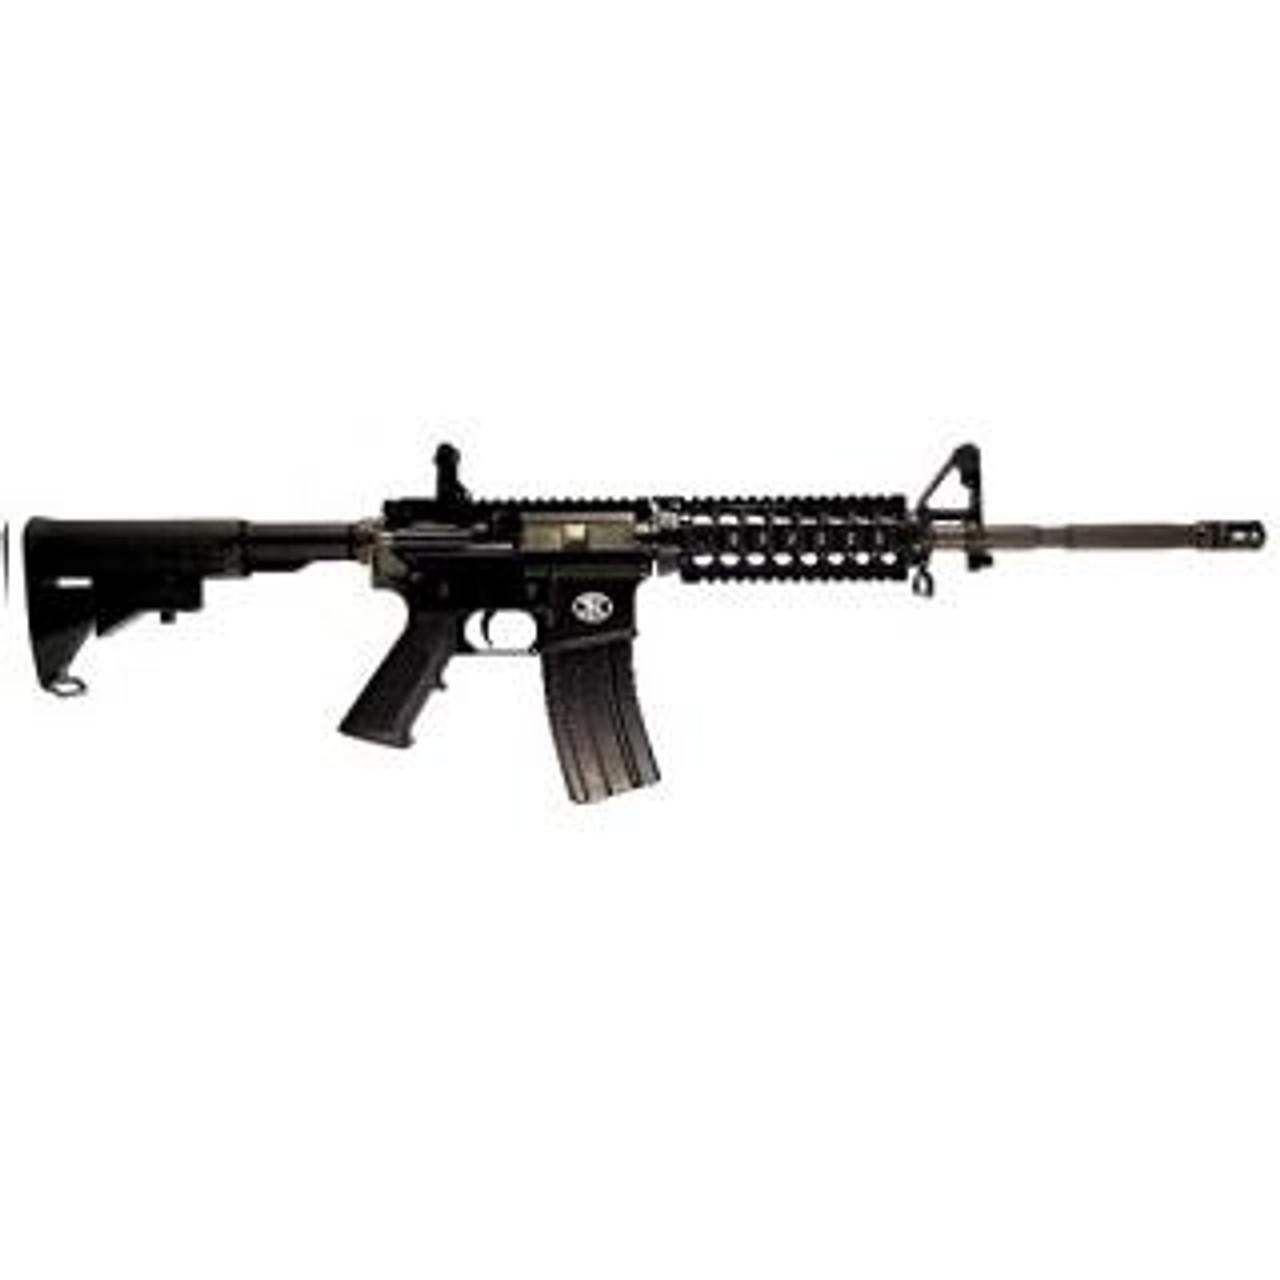 FNH FN15 Patrol Carbine CALIFORNIA LEGAL - 5.56